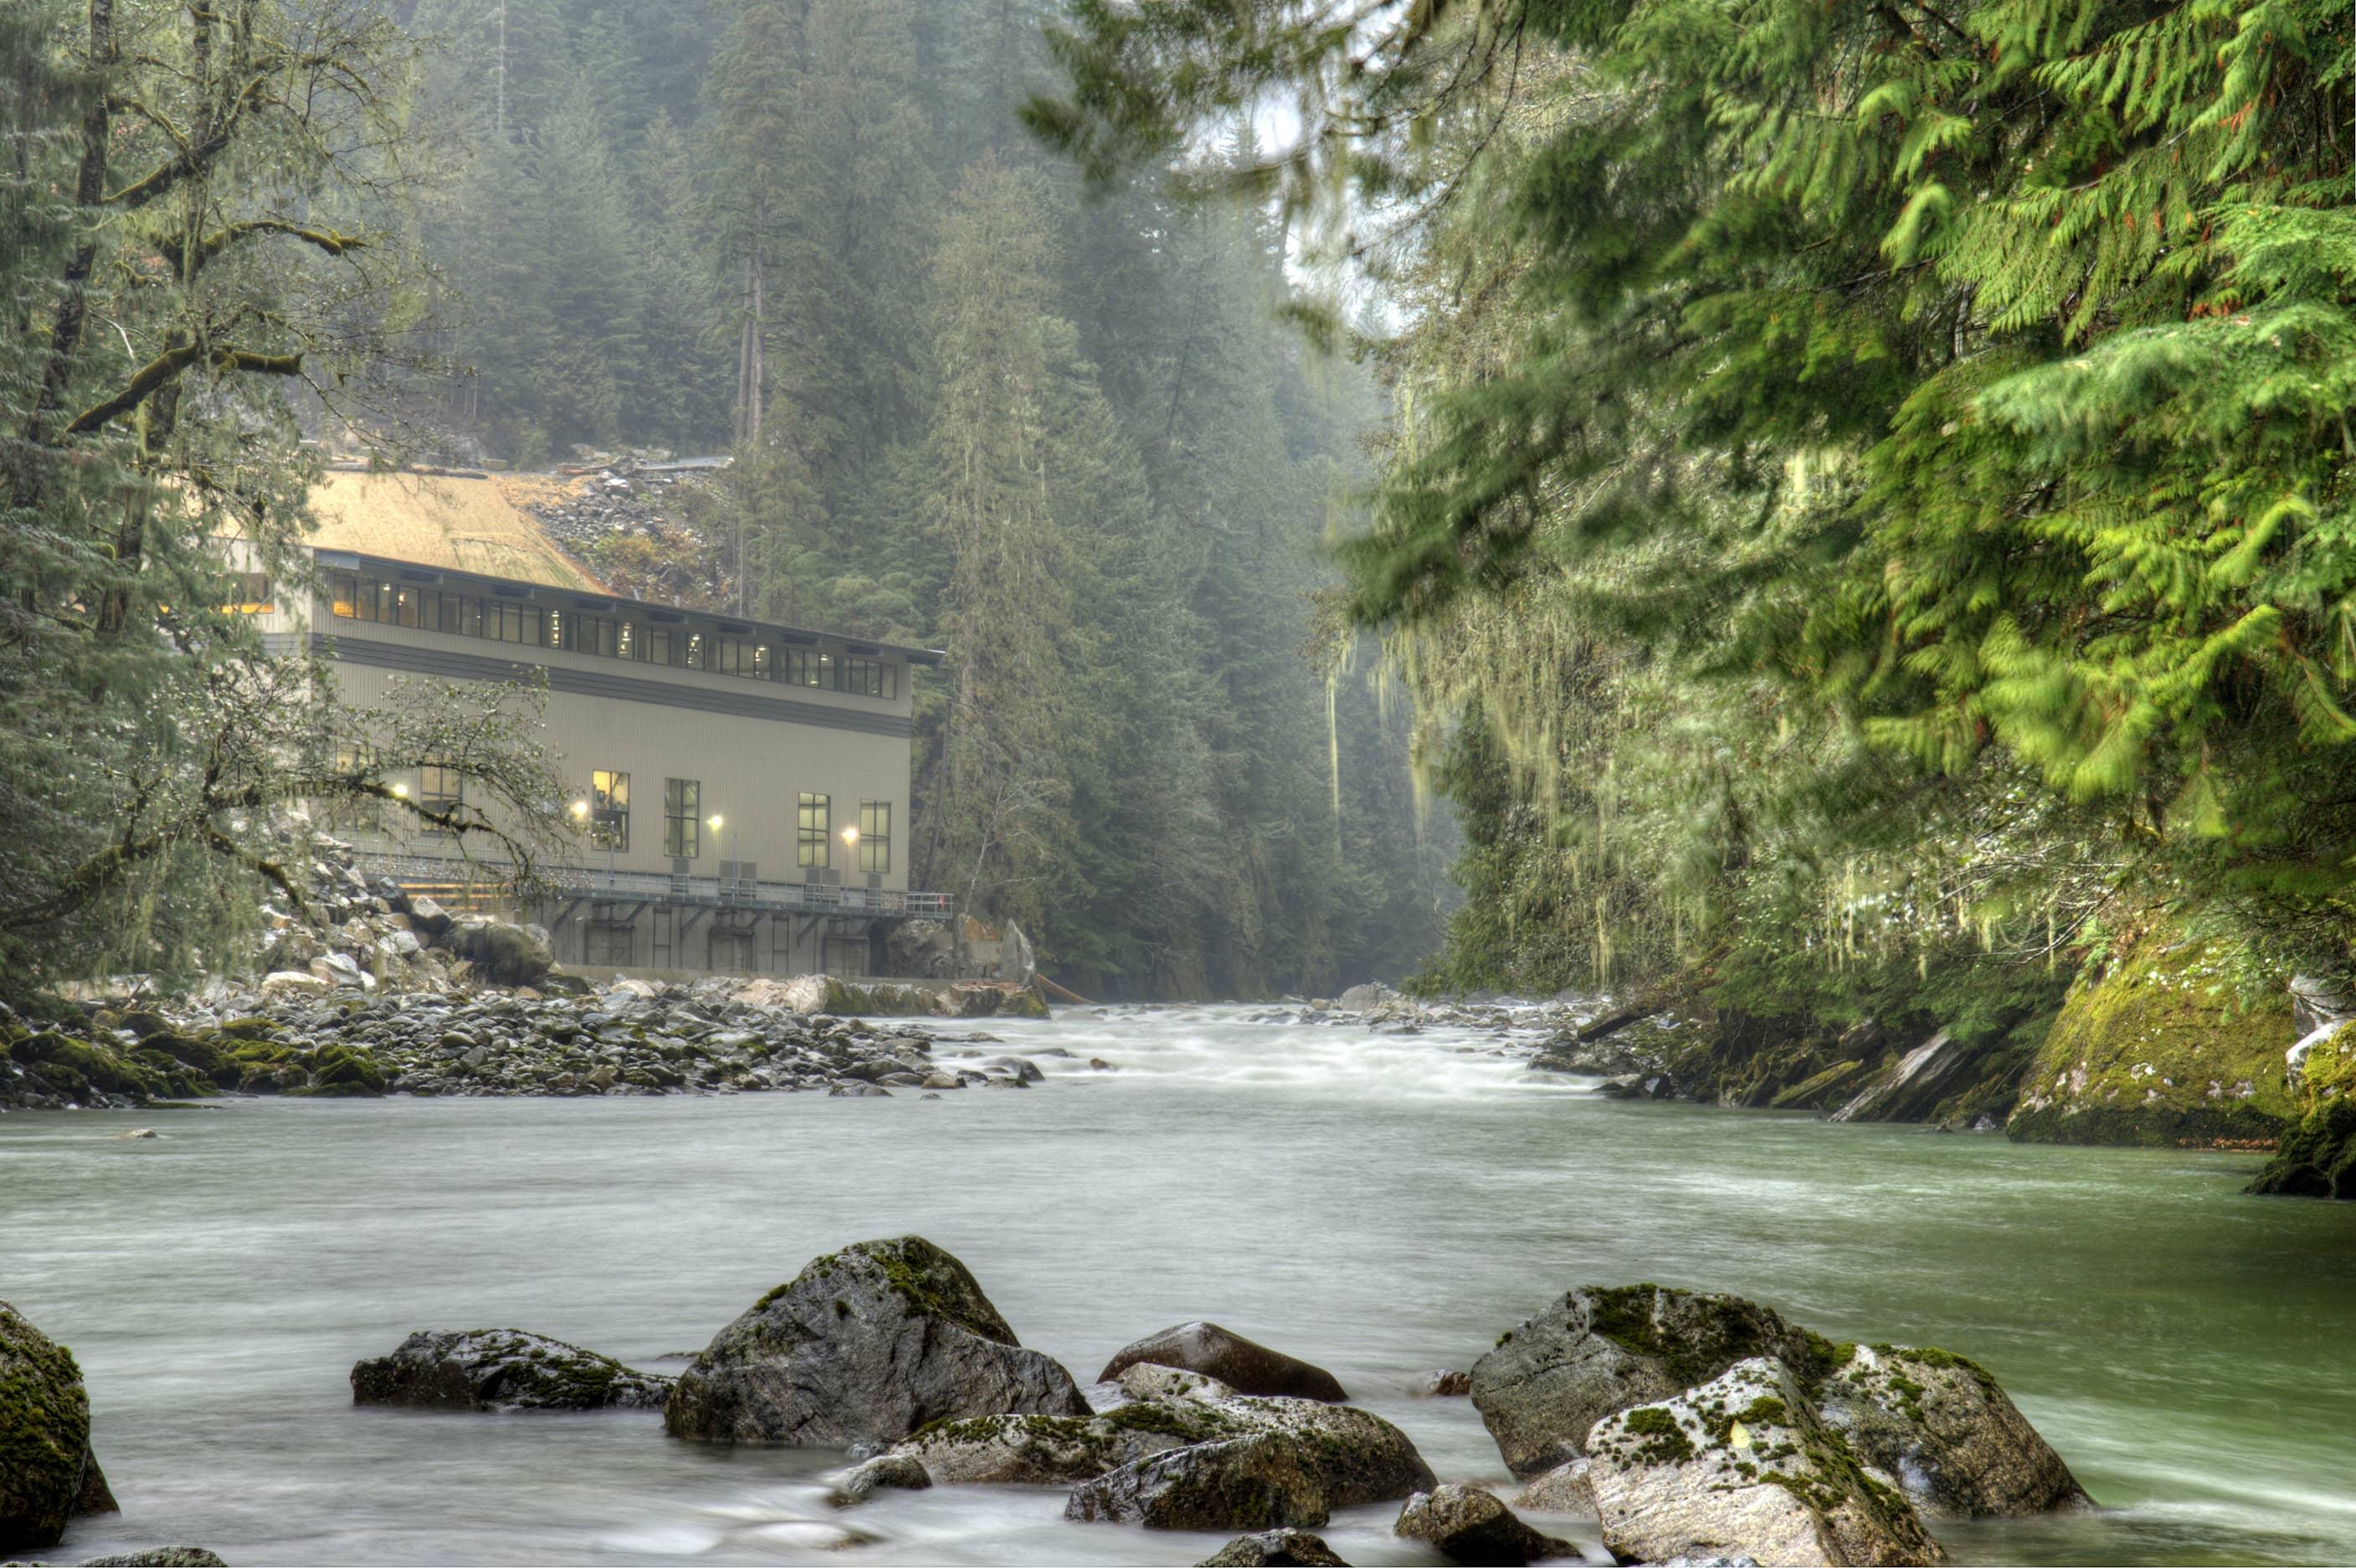 bbp ashlu creek run-of-river hydroelectric plant exterior 2